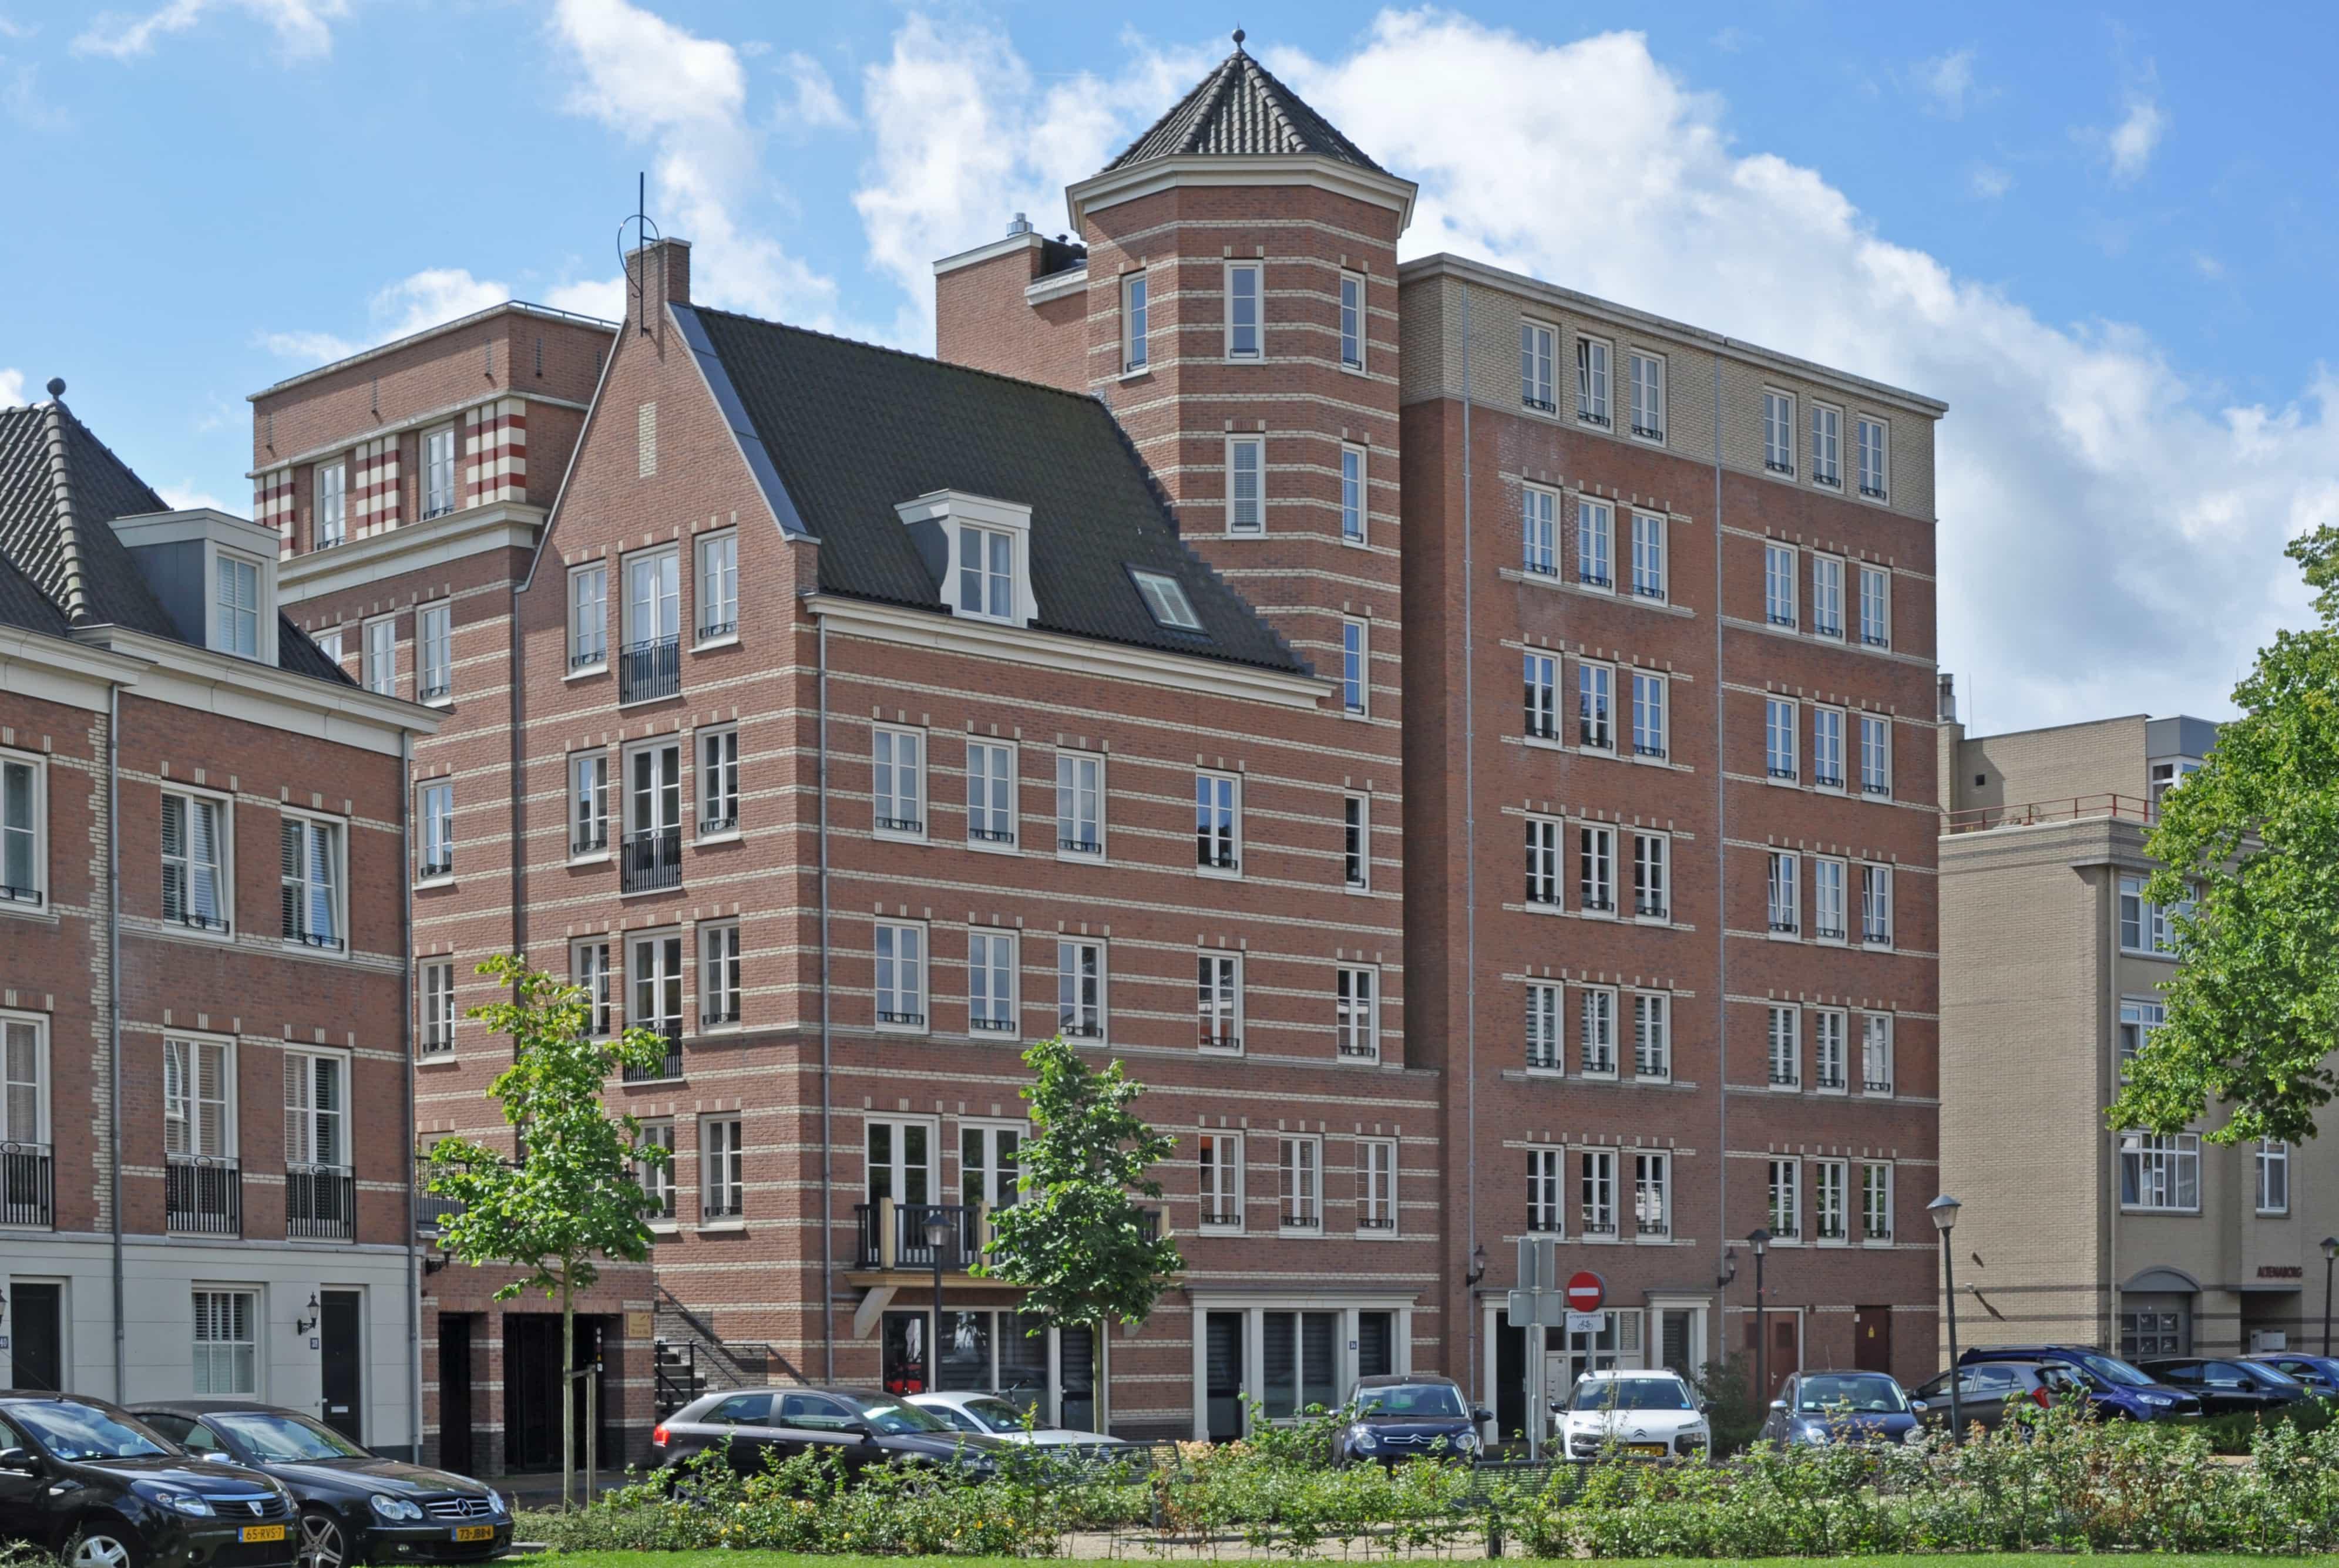 Nonnenveld Gorinchem